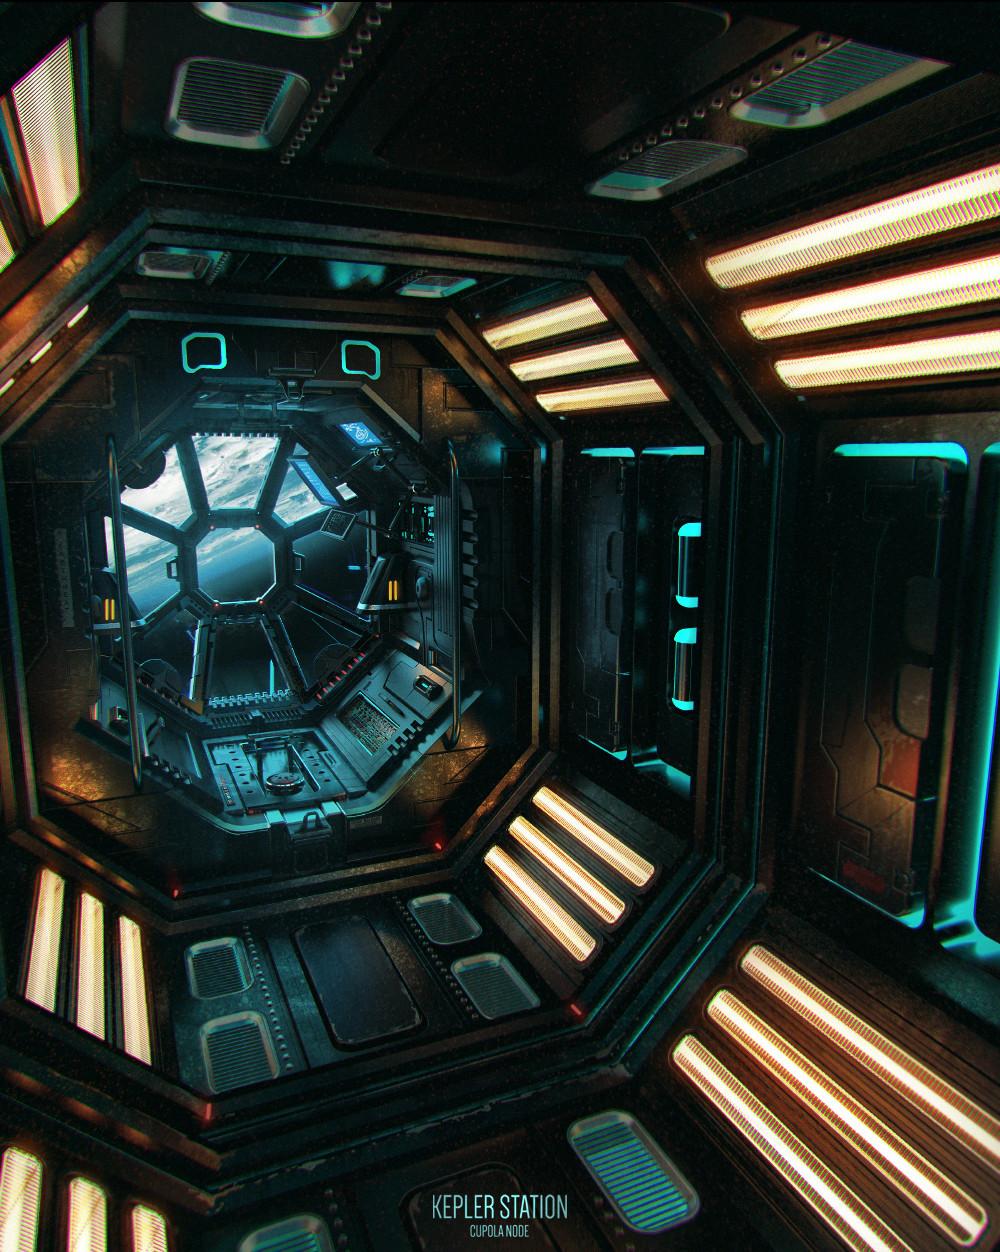 Rene aigner moi space1 website